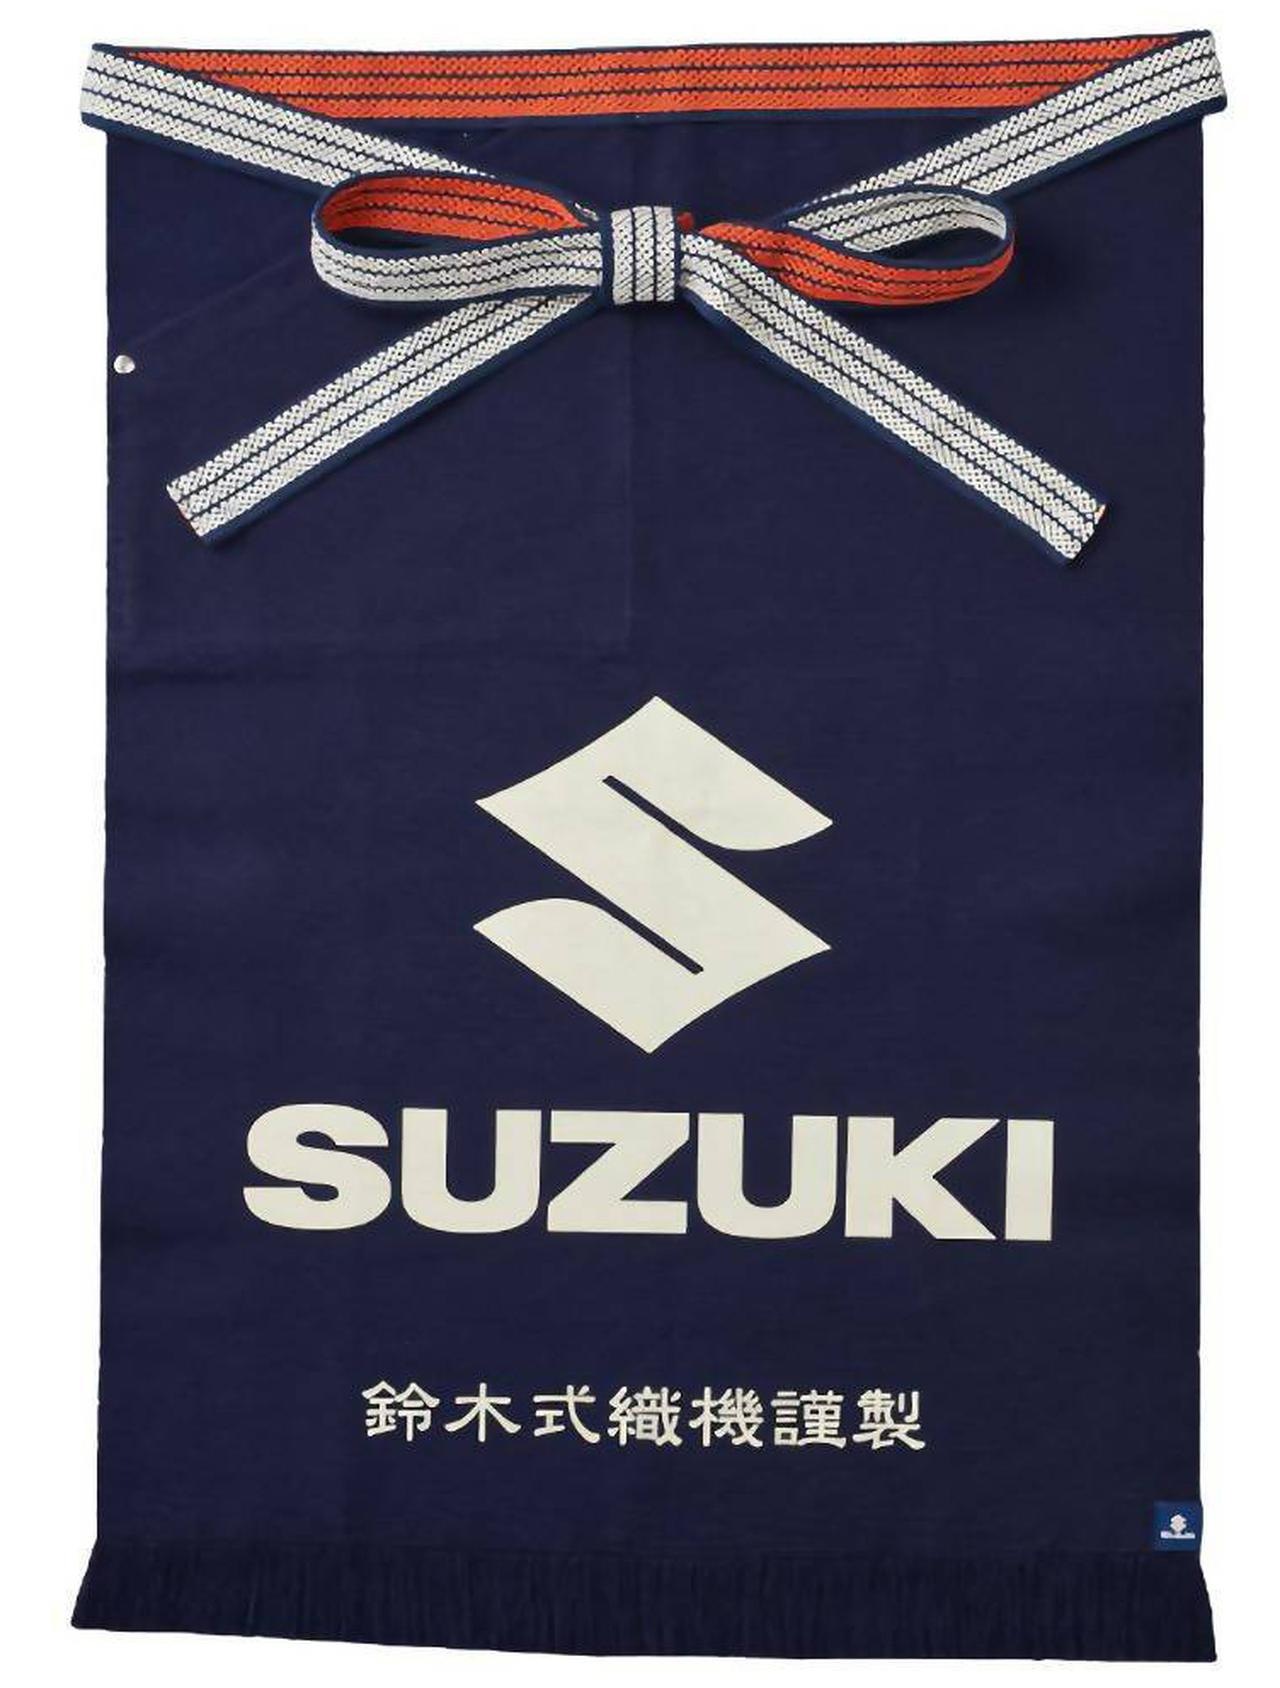 画像: 「鈴木式織機製 前掛け SUZUKI」8,030円(消費税10%込み)